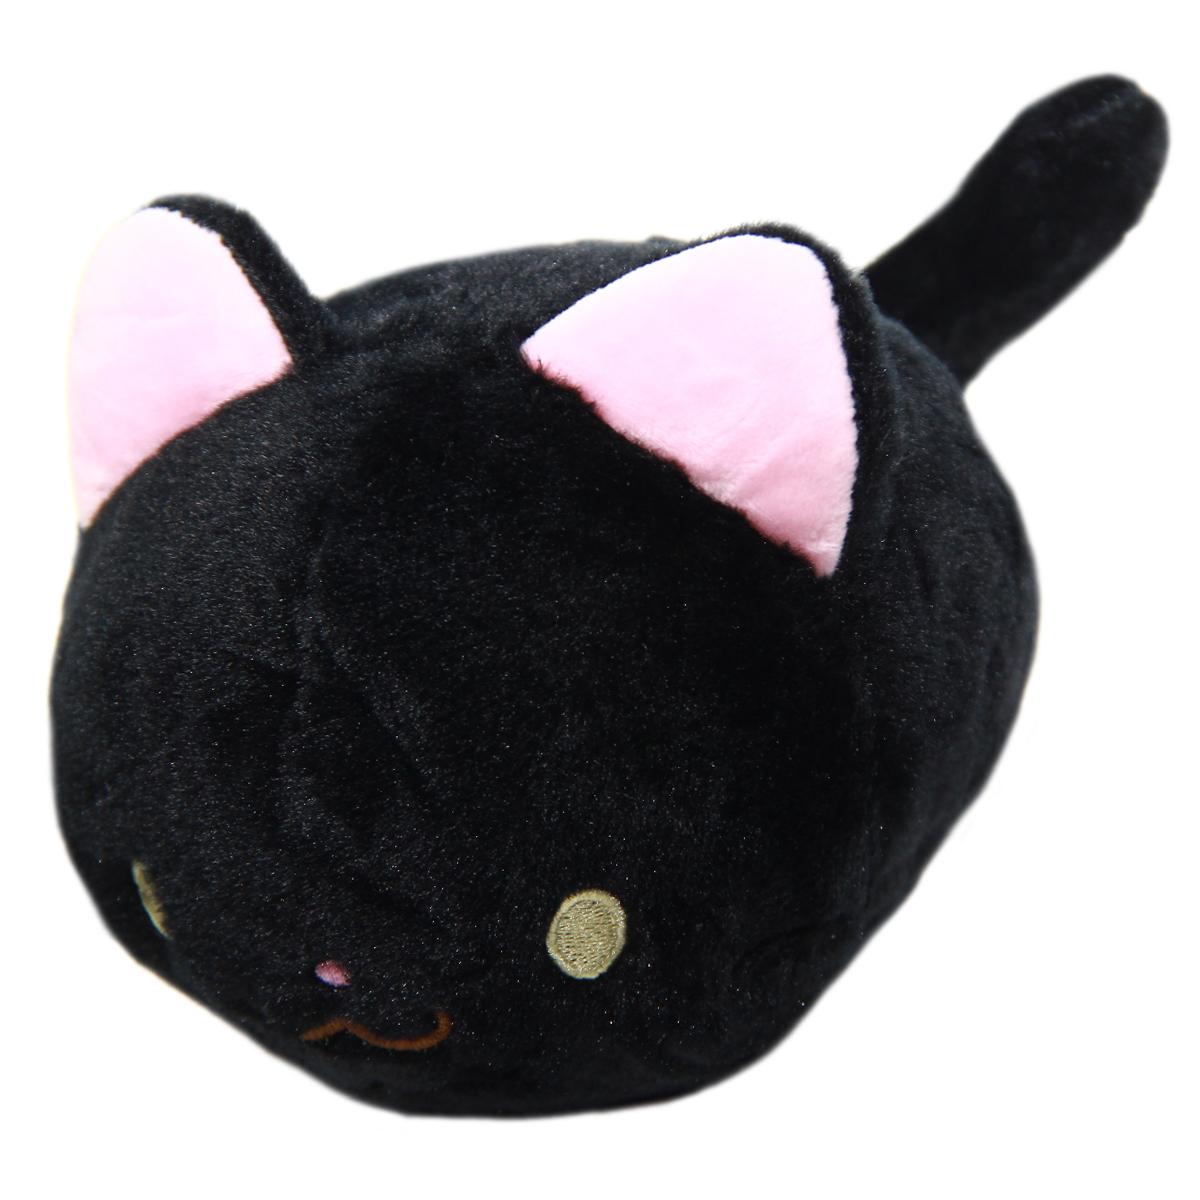 Kawaii Neko Plushie Black Cat Plush Doll Super Soft Stuffed Animal Standard Size 6